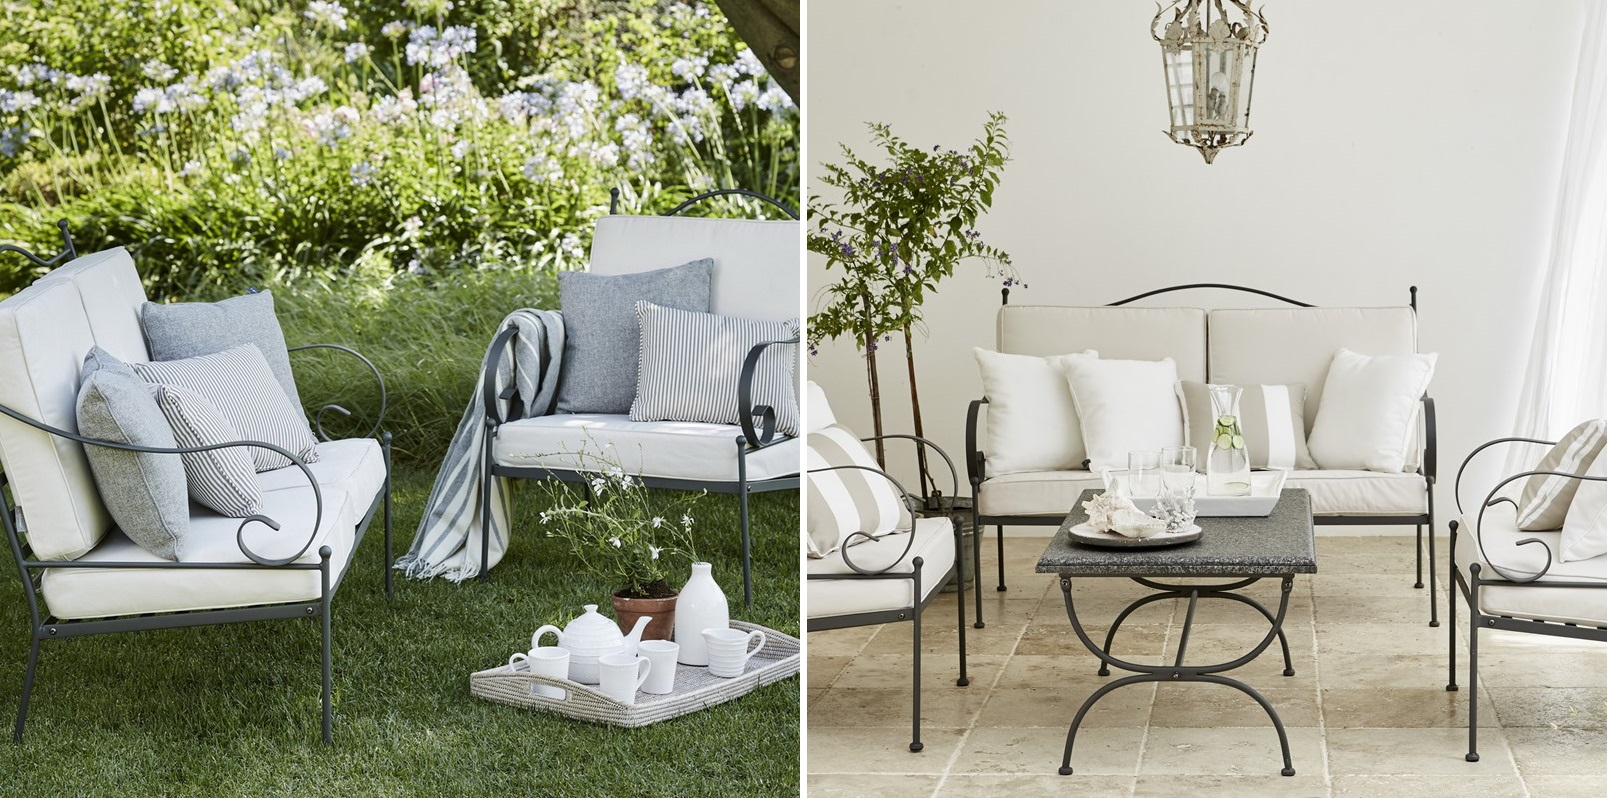 Amenajare terasa mobilier la maison stil romantic